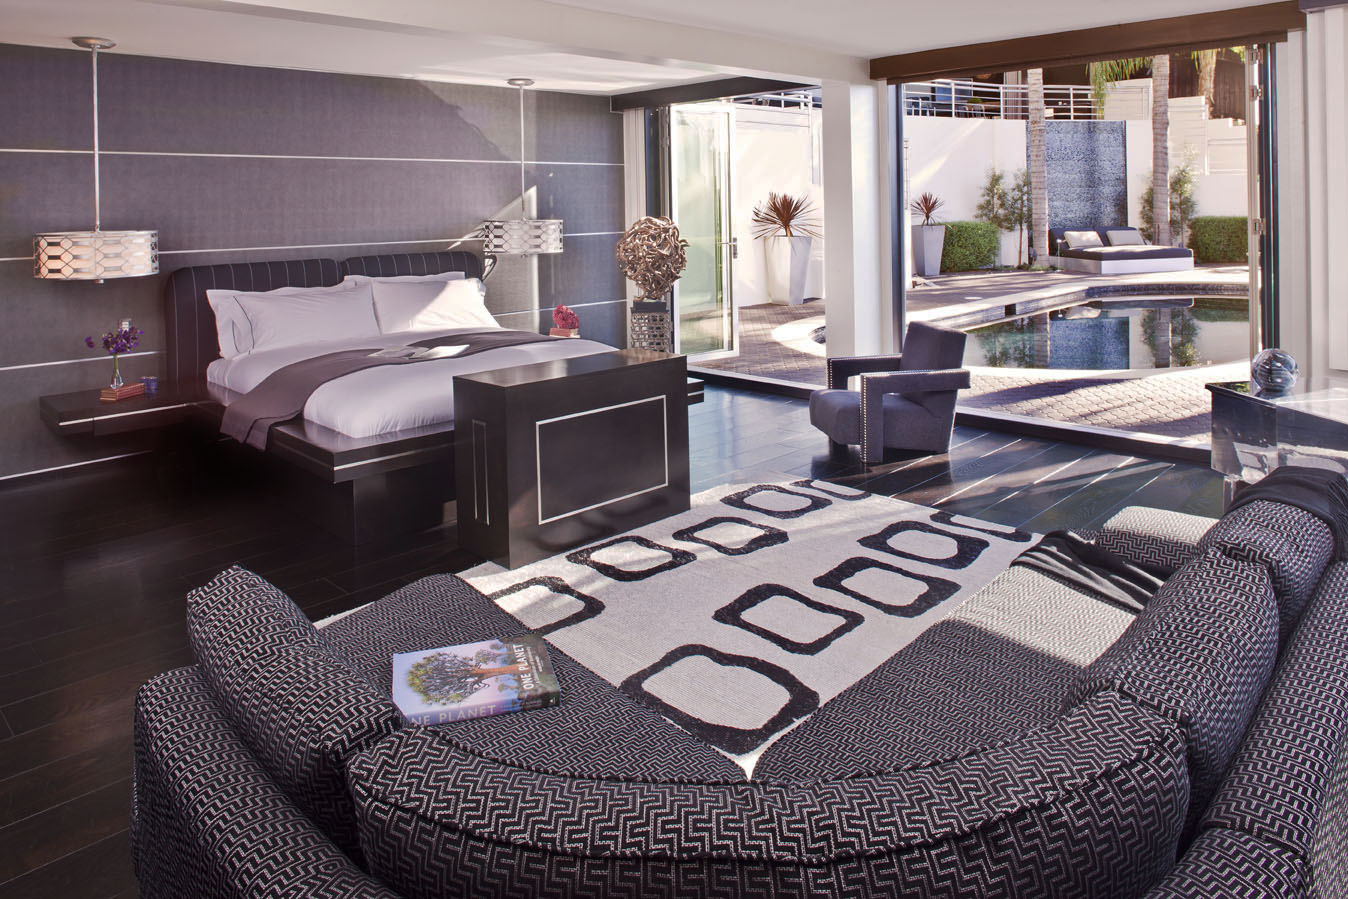 kari whitman bedroom open space